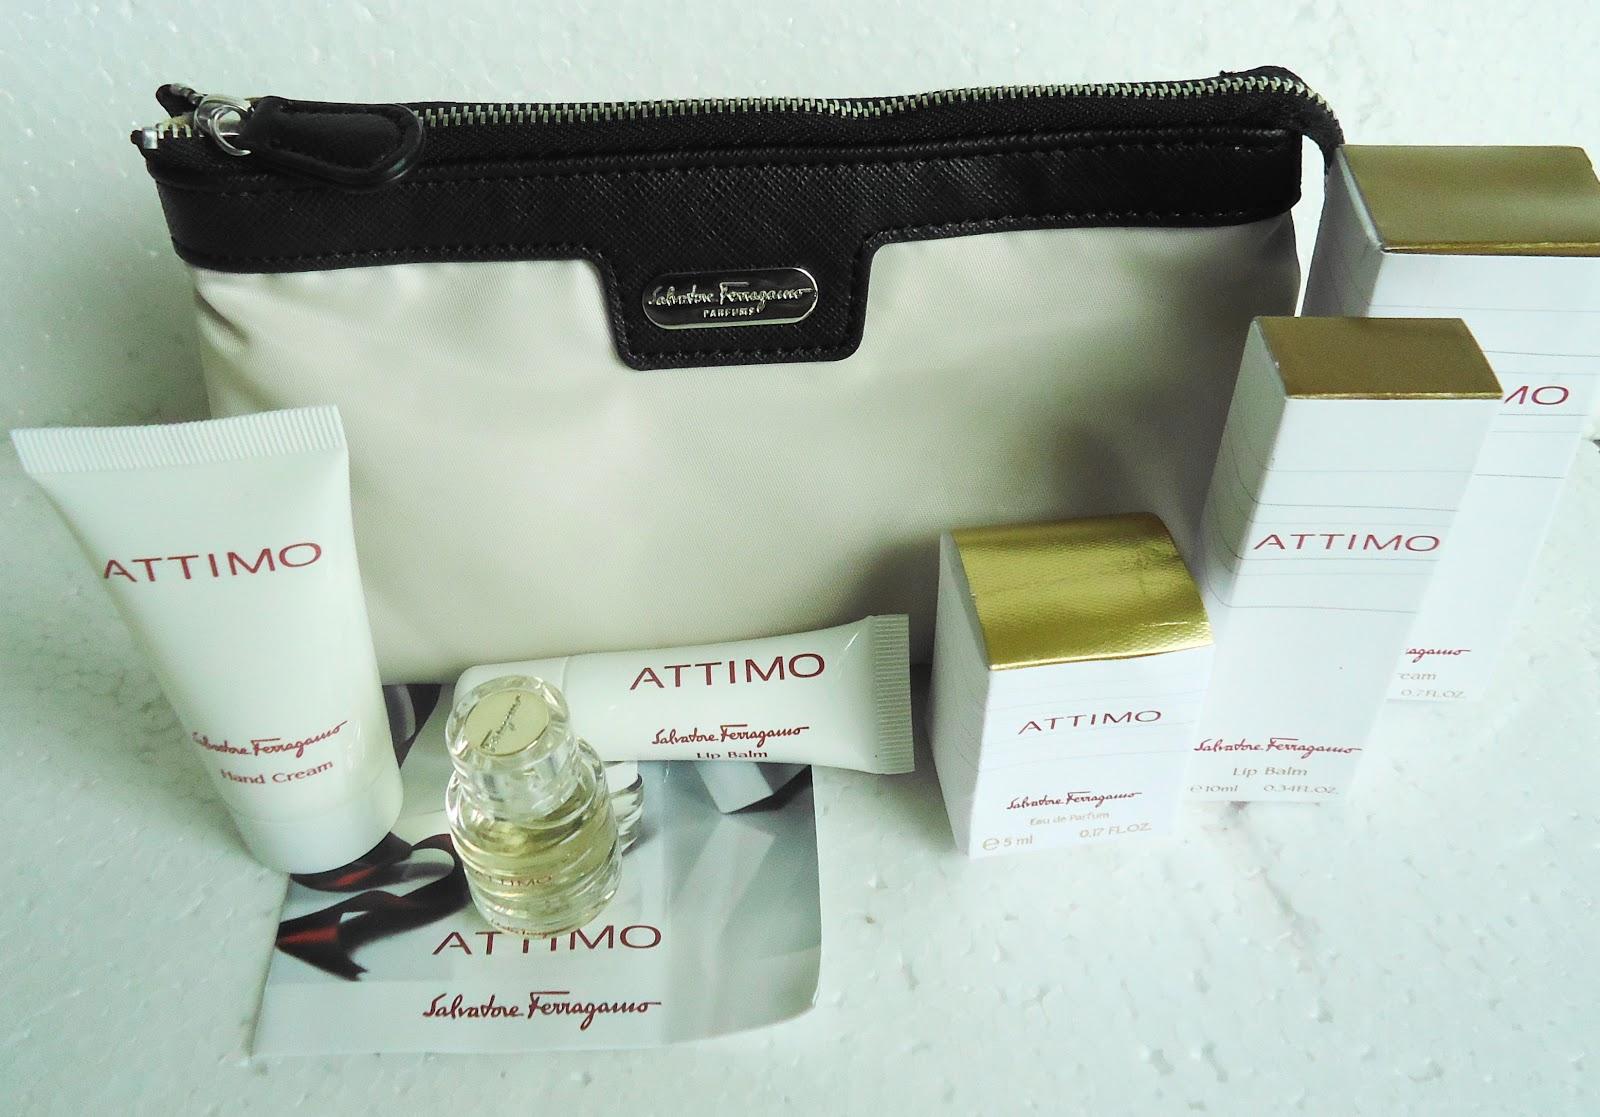 Boneka Keren Aksesoris Amenity Airlines Tas Dompet Kosmetik Makeup Make Up Hp Parfum Pouch Motif Bunga Bdp013